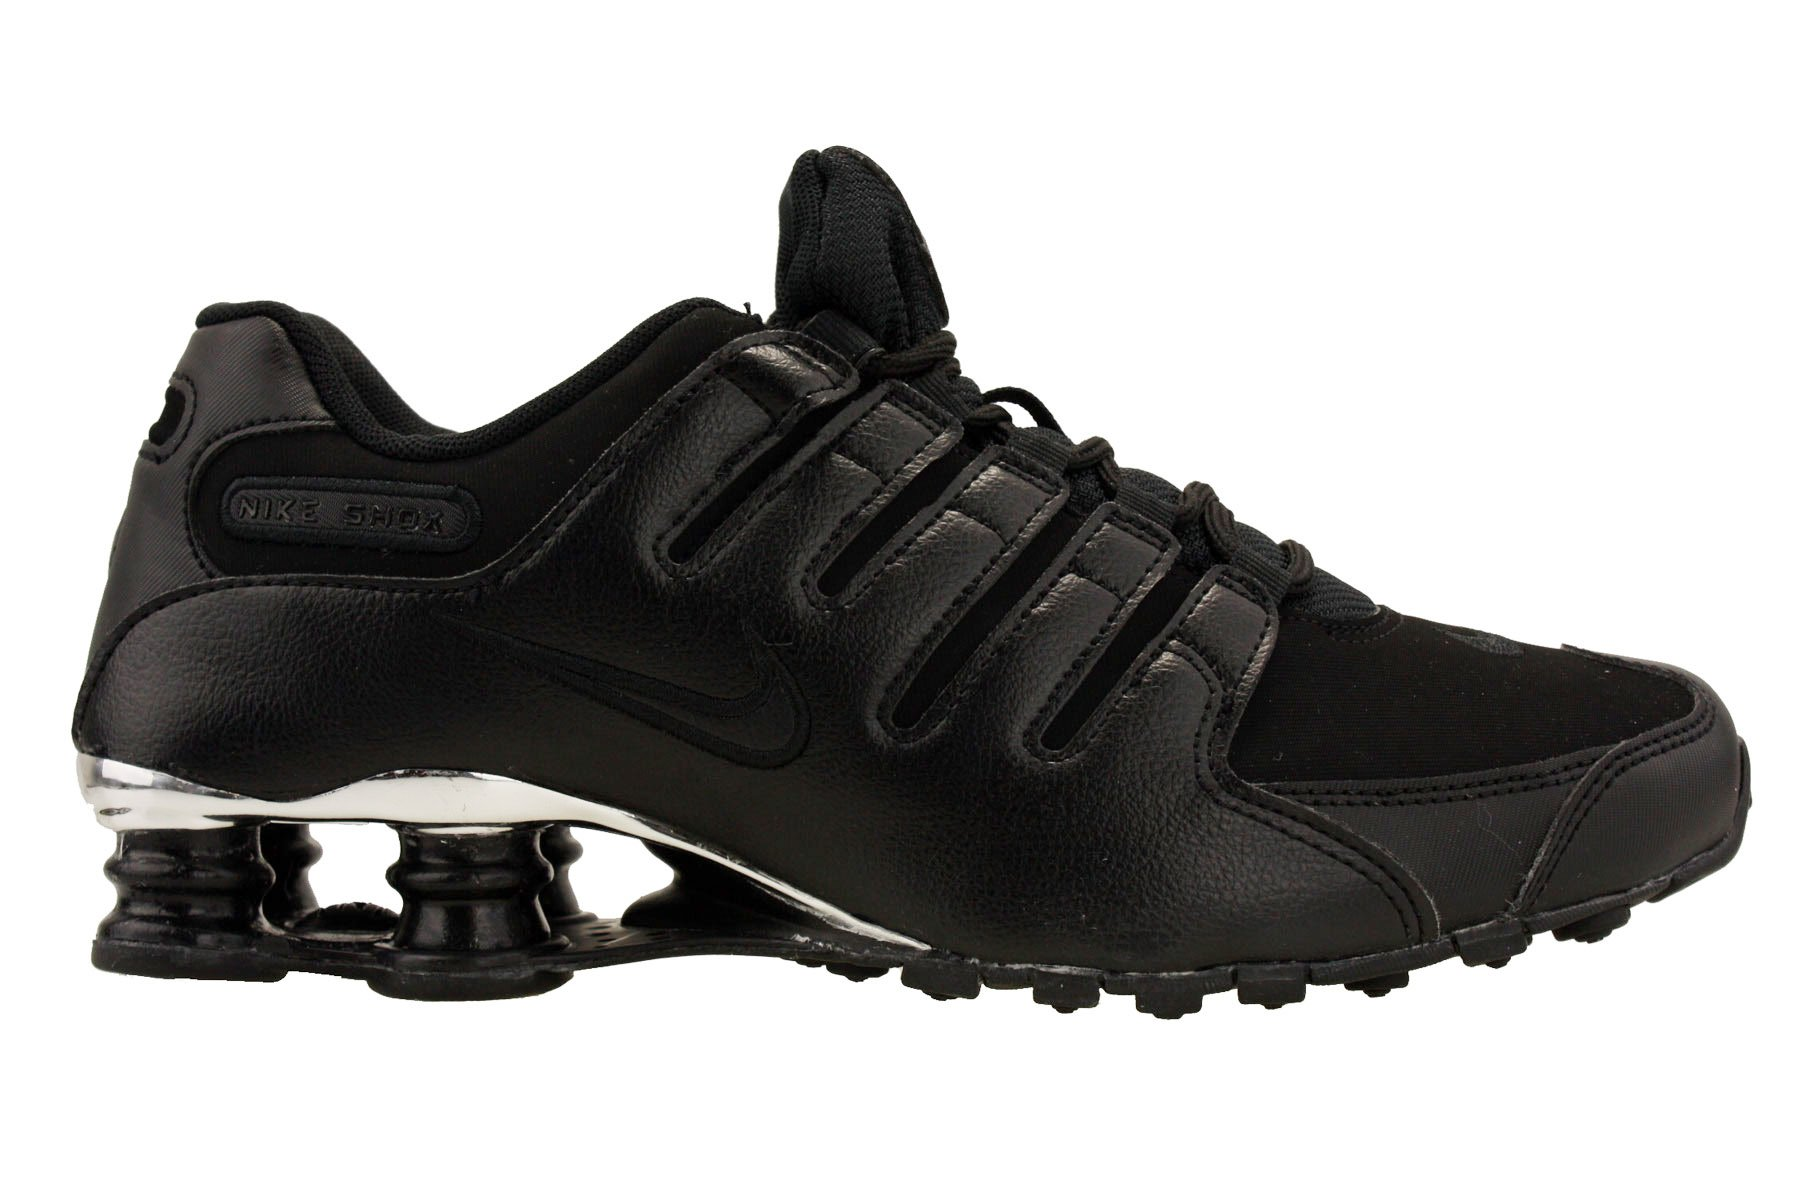 ba37a83211b Galleon - Nike Mens Shox NZ Premium Running Shoes Black Chrome 536184-001  Size 10